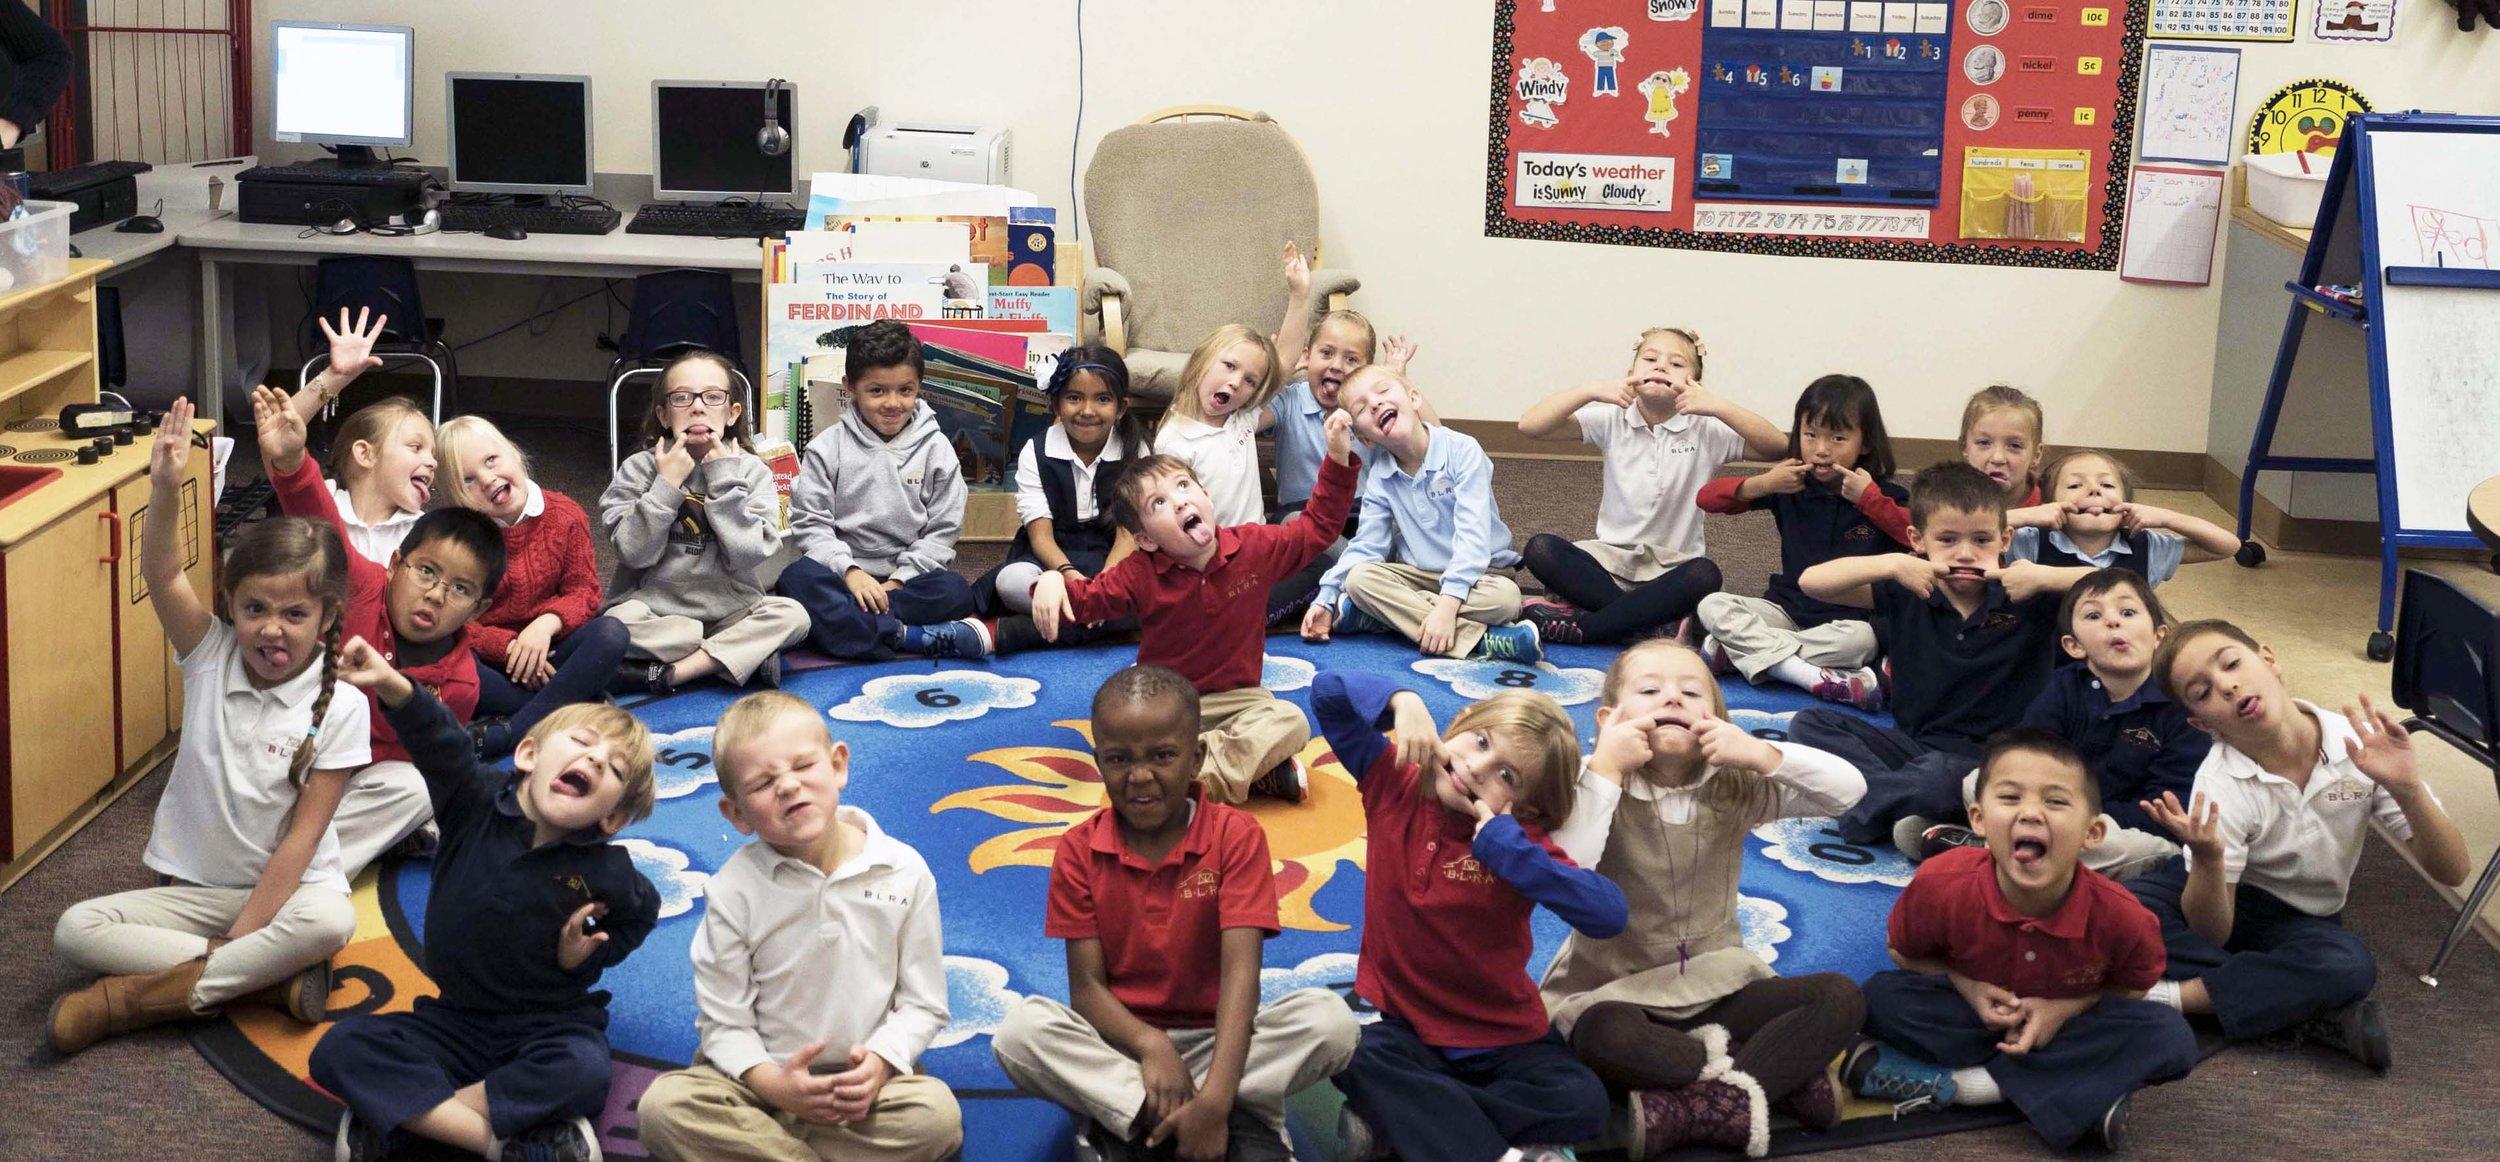 Kindergarten Students Sitting on Carpet